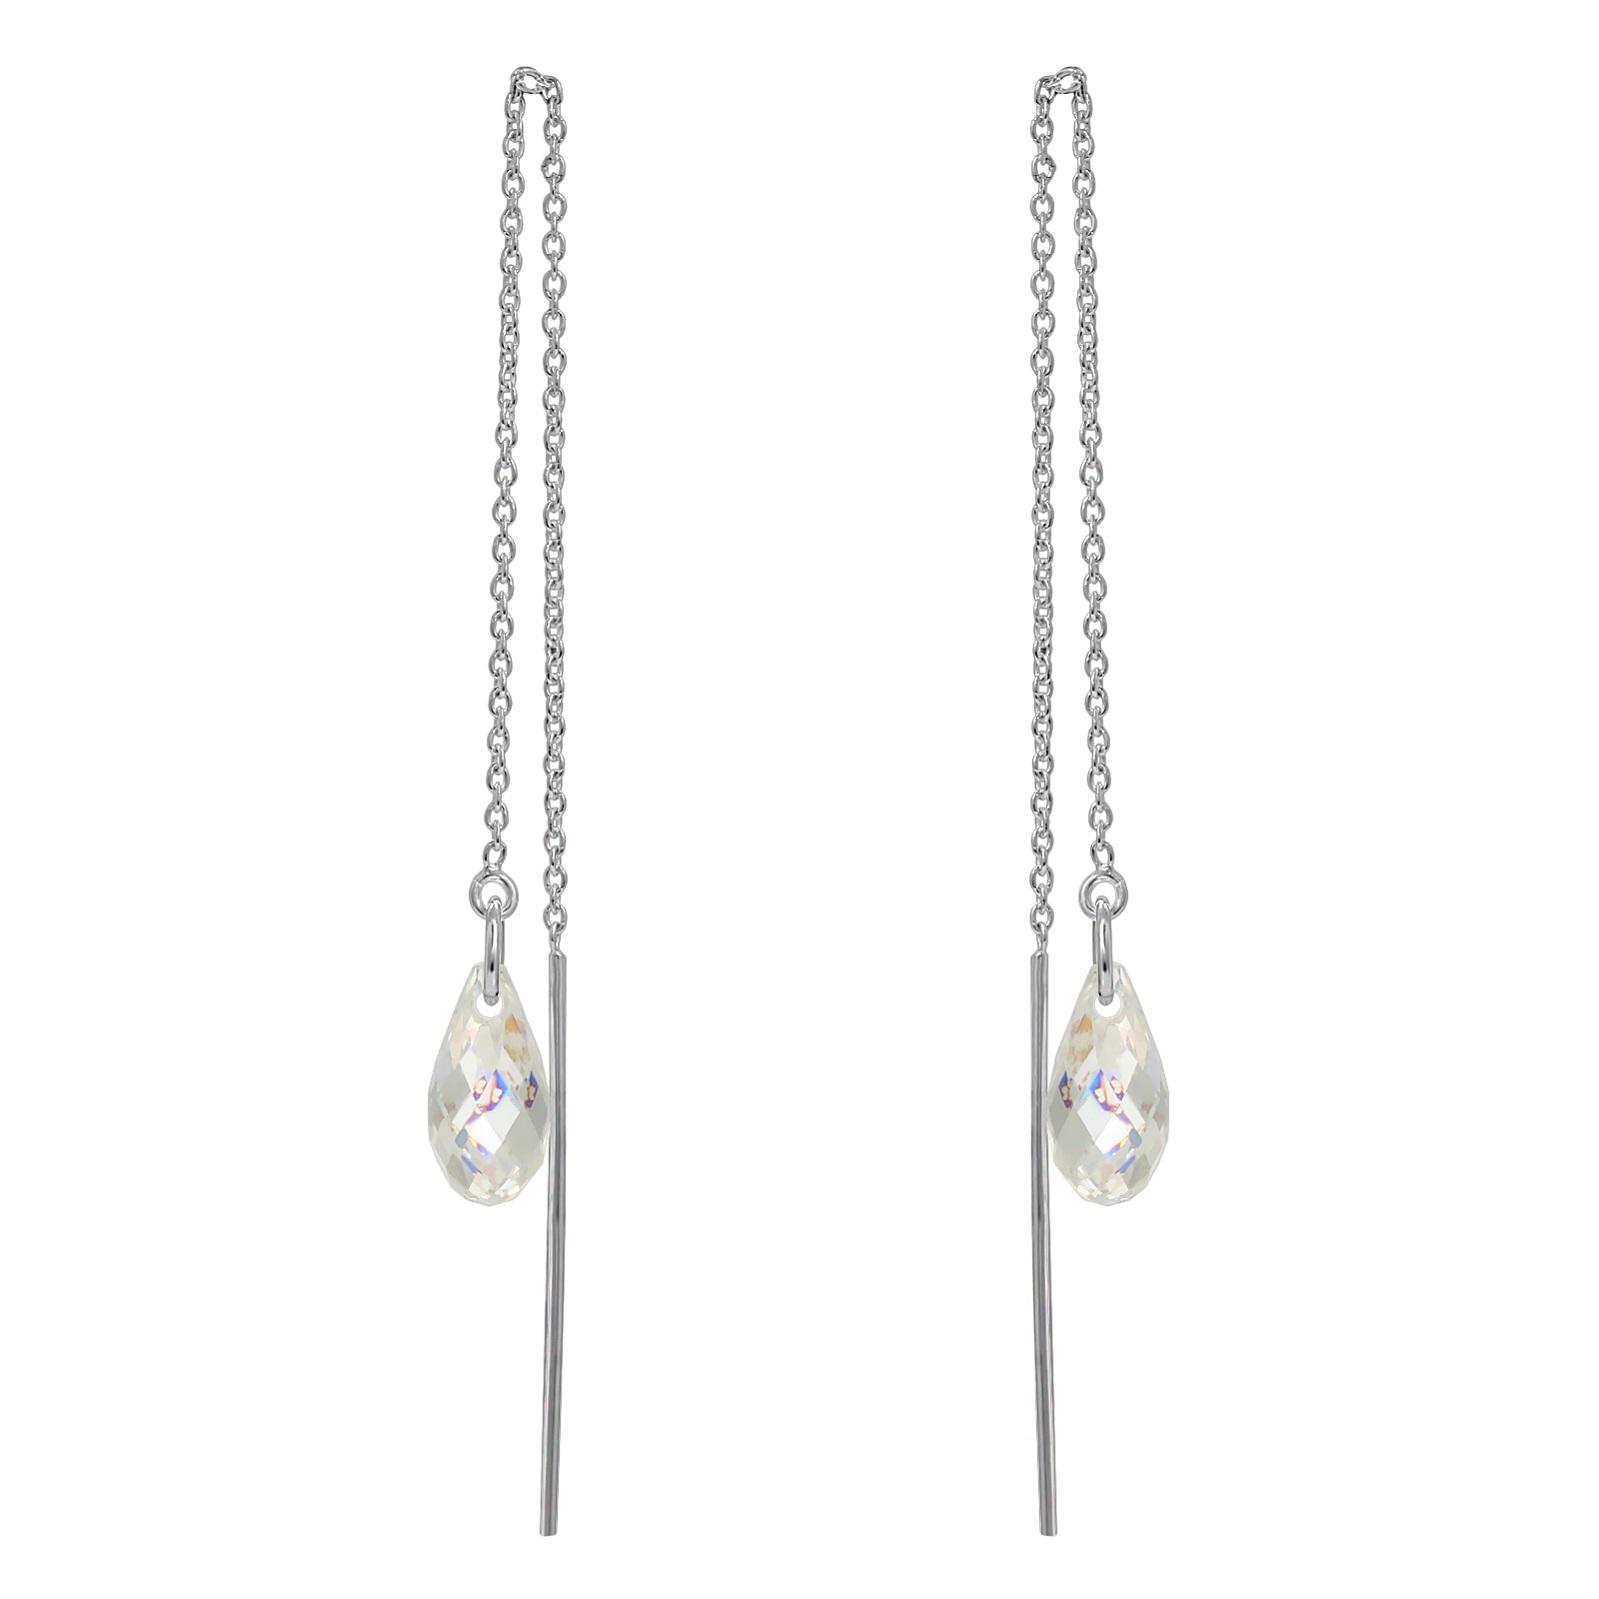 Crystal Briolette Threader Earrings - Swarovski Crystals Elements White Patina